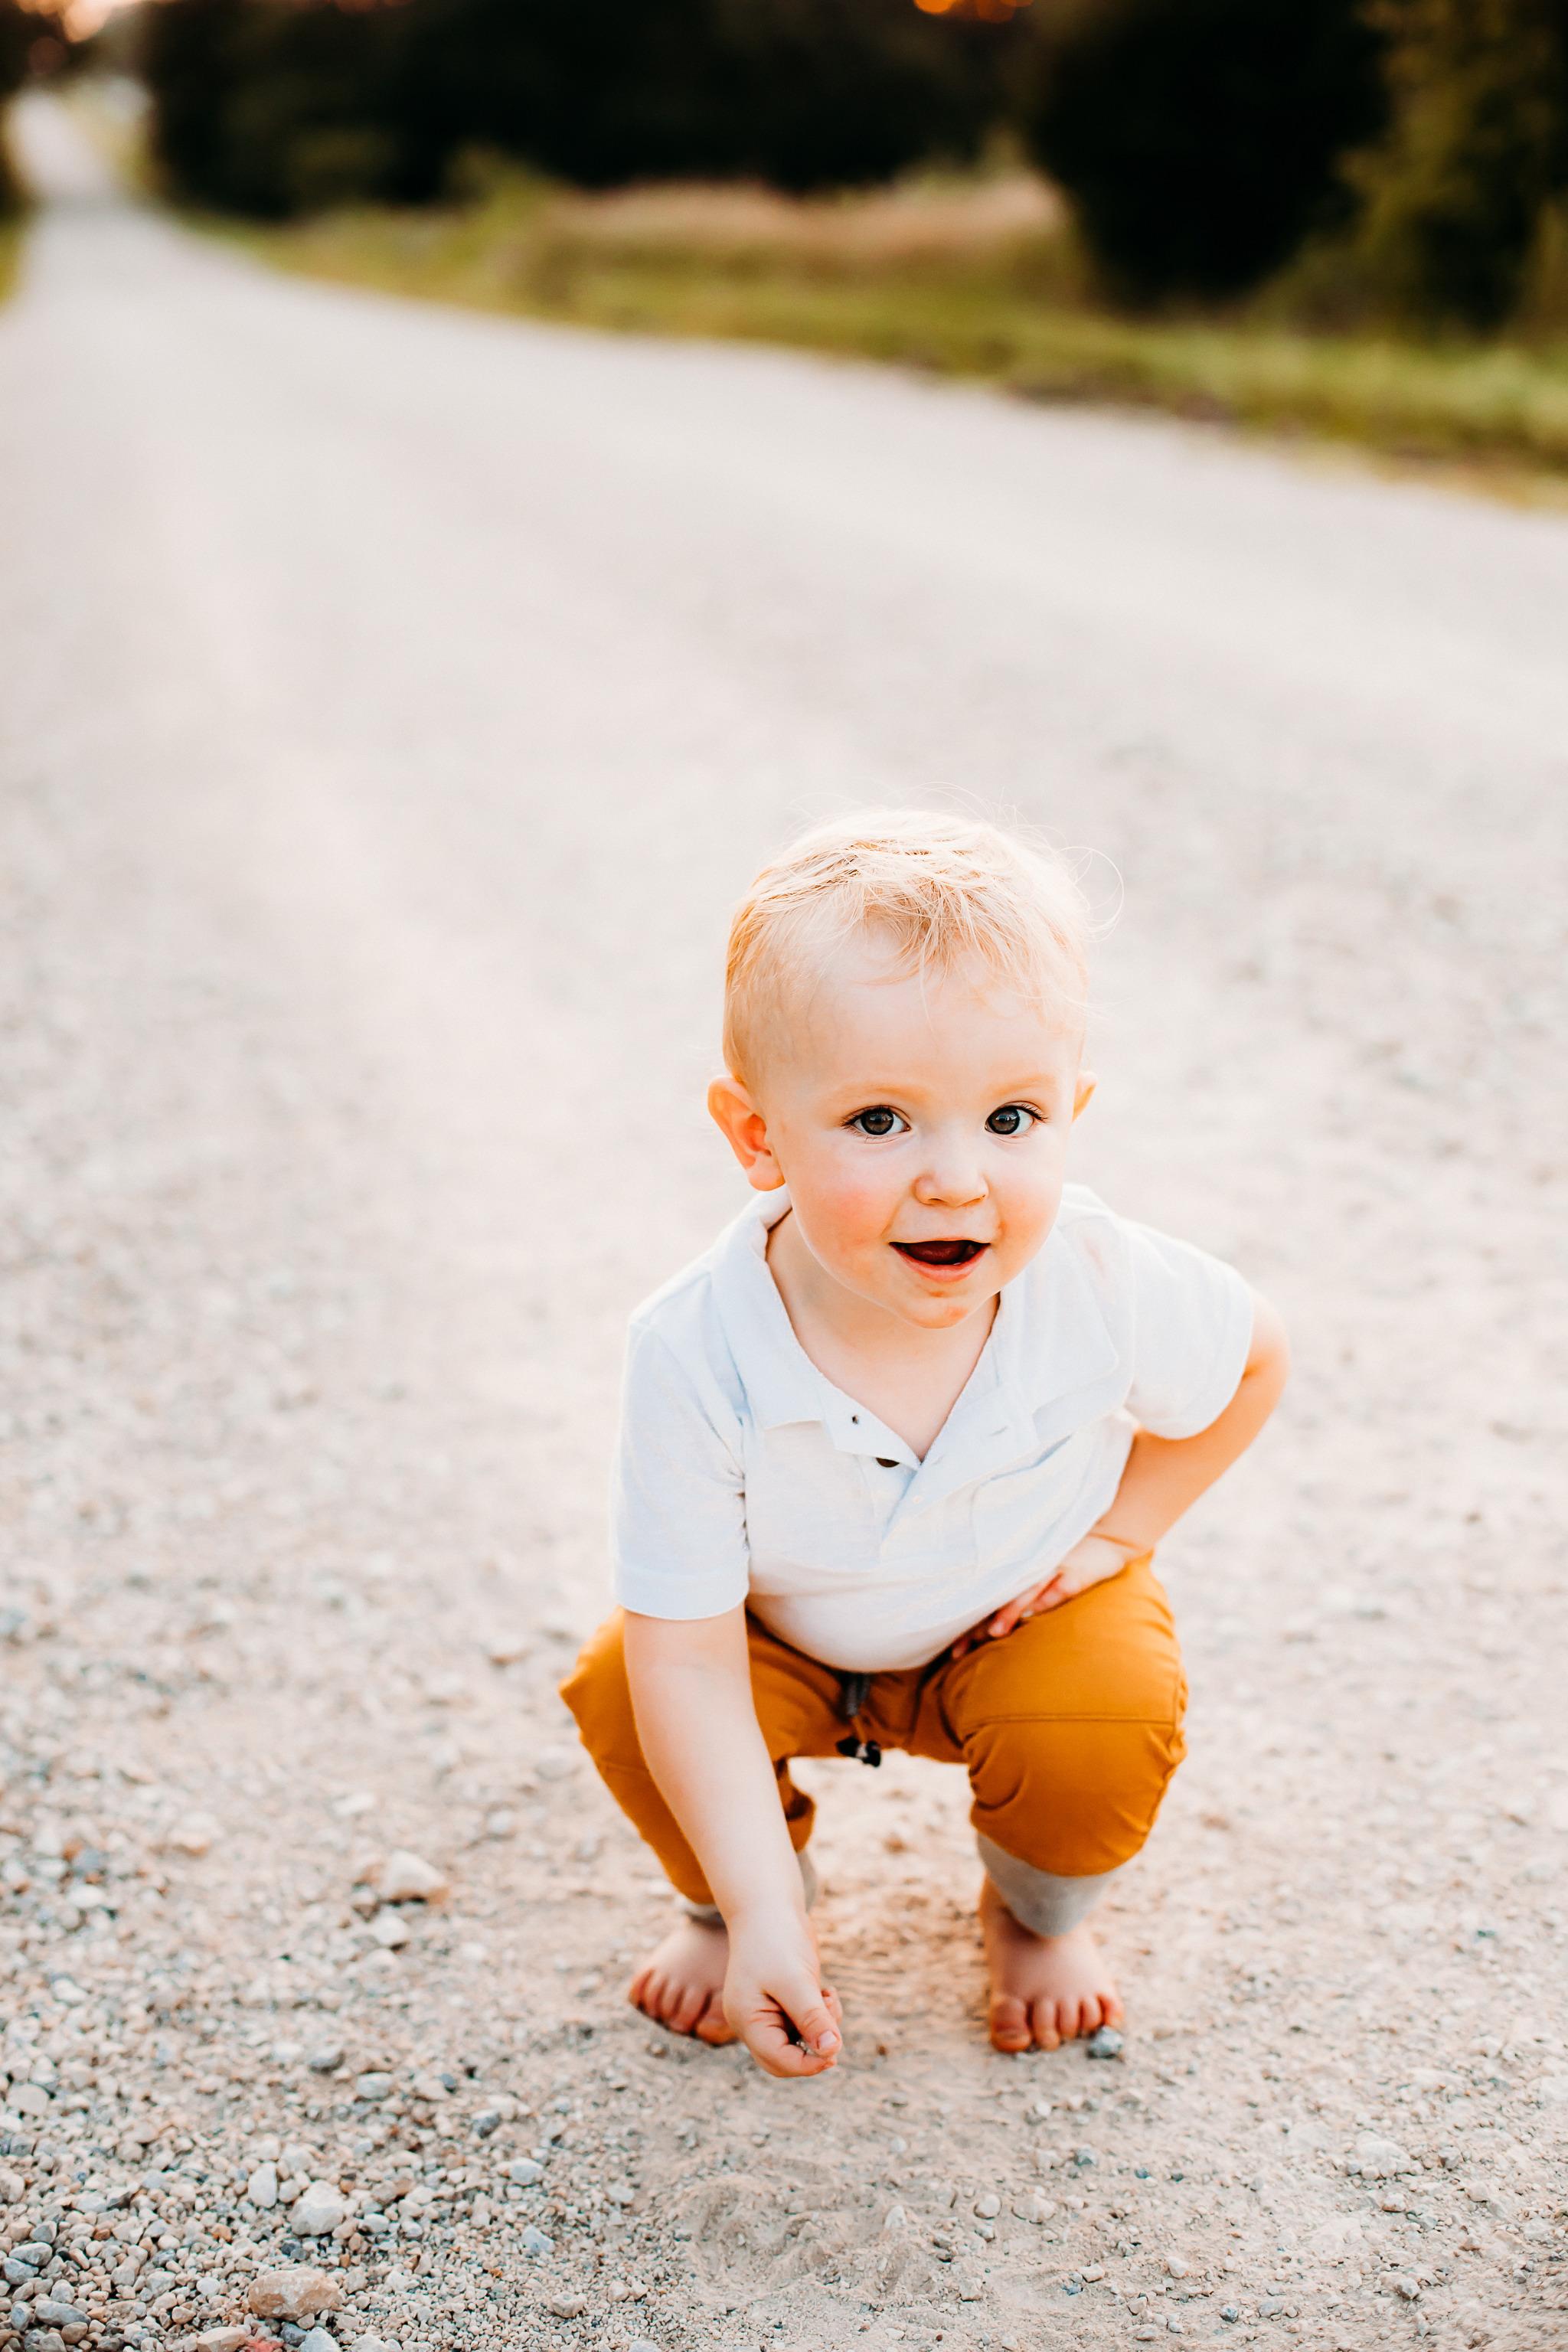 lawrence kansas photographer, kansas, olathe ks, newborn photographer, infant photographer, overland park kansas, topeka, sunset photography, infant photography, lawrence kansas photographer